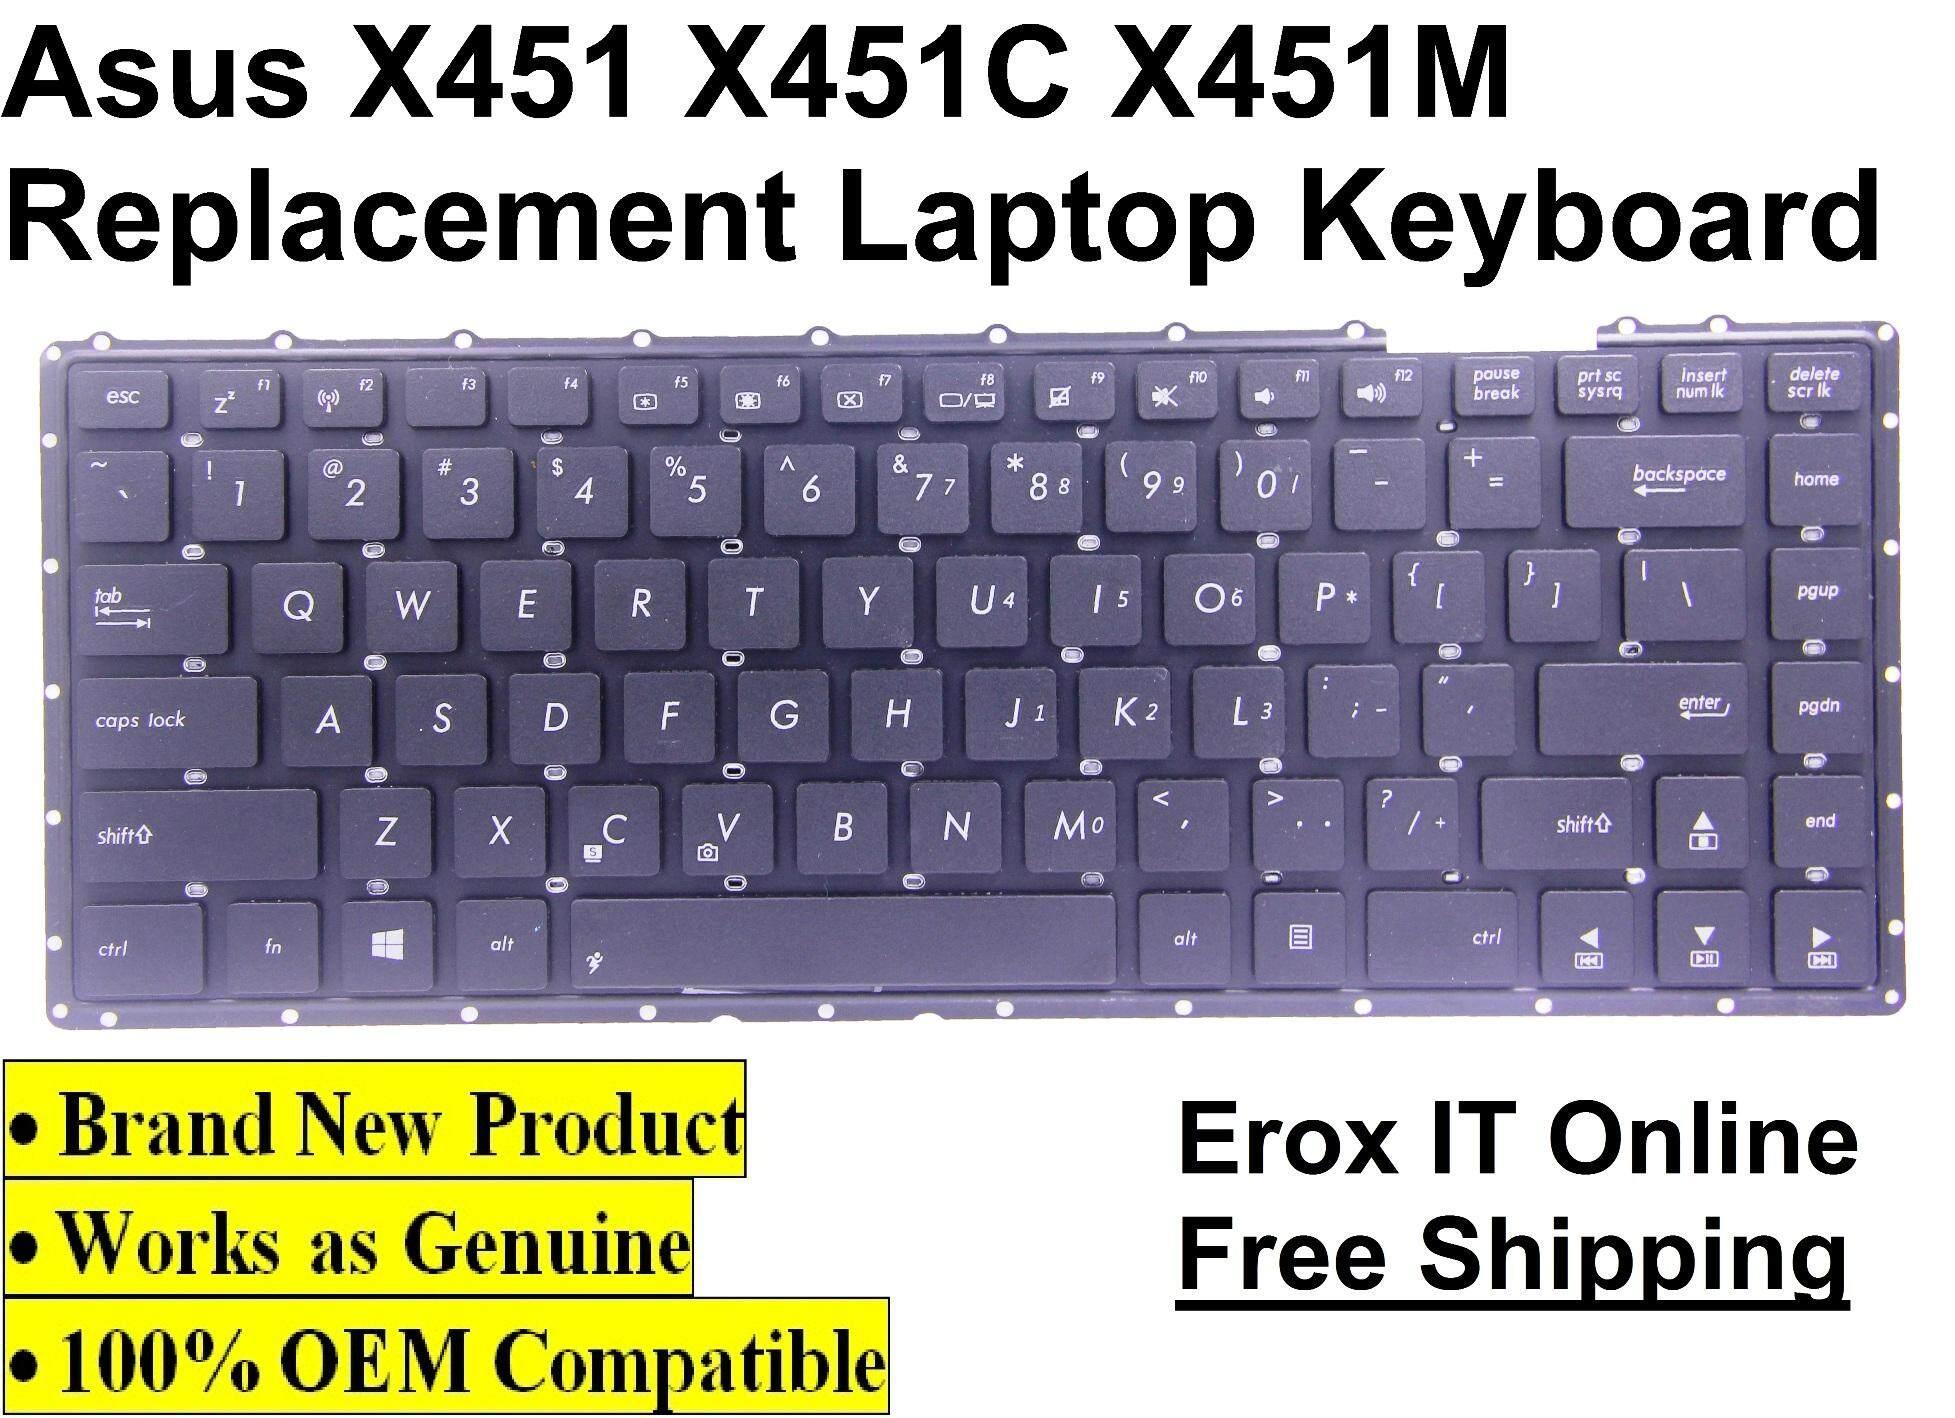 Harga Jual Keyboard Asus X451c X452 Price In Malaysia A455l D451 D451e X451 X451m X551 Best X552c Oem Replacement A550